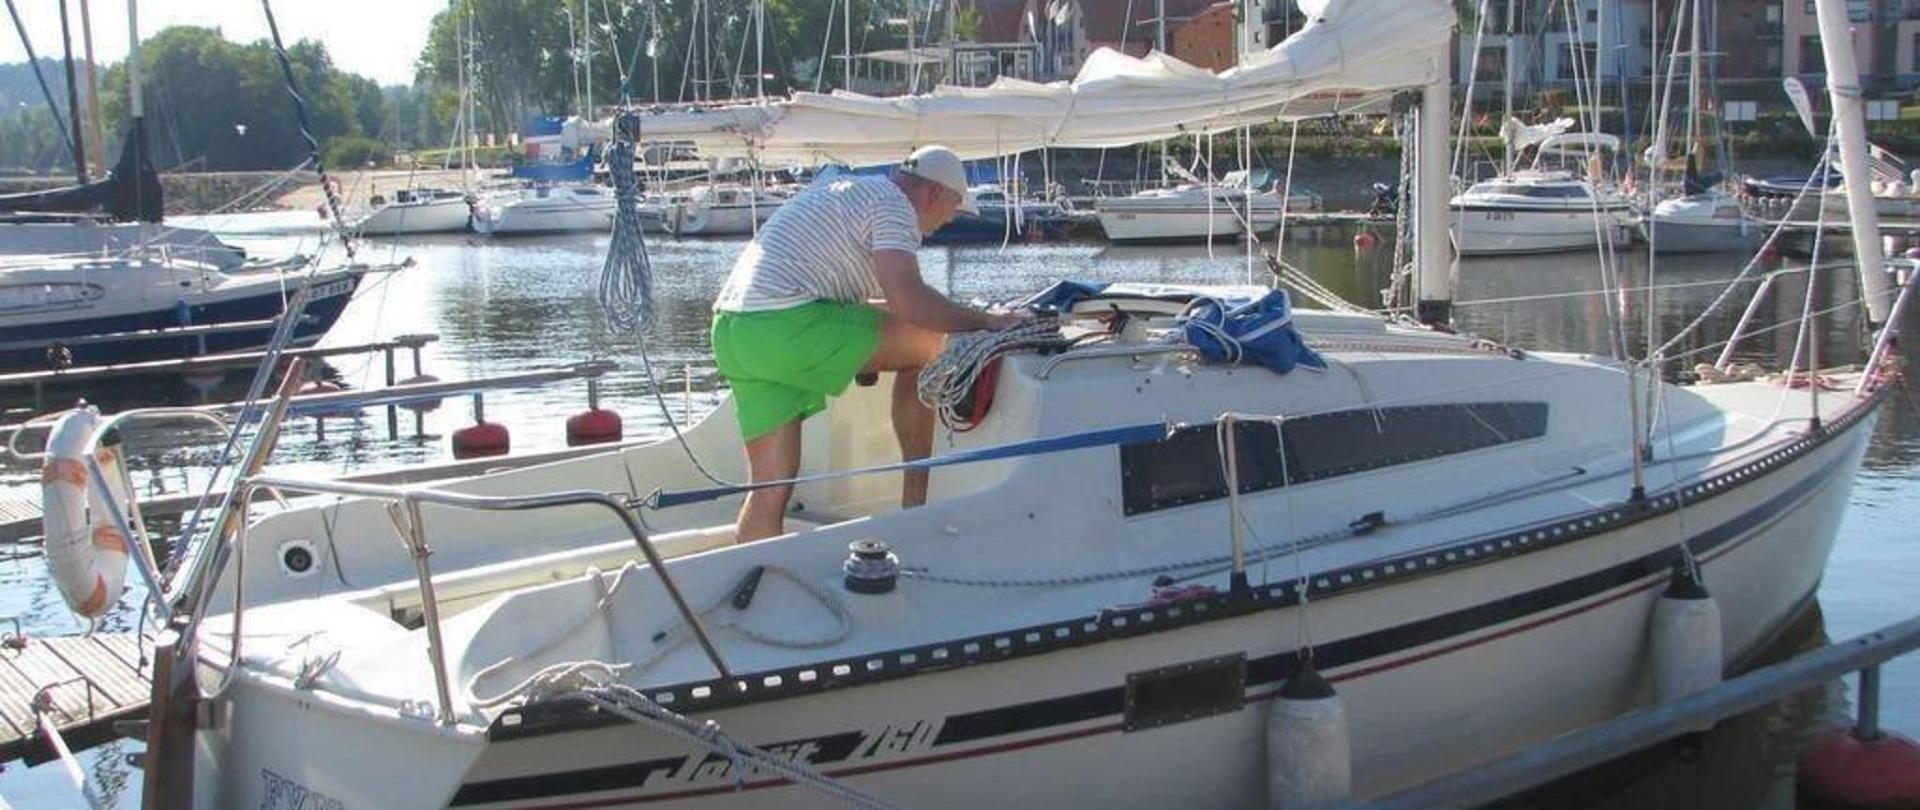 lipno-rd-ασφάλτου-ψαριού-k-svobodovci-29-8-2015-007-2.jpg